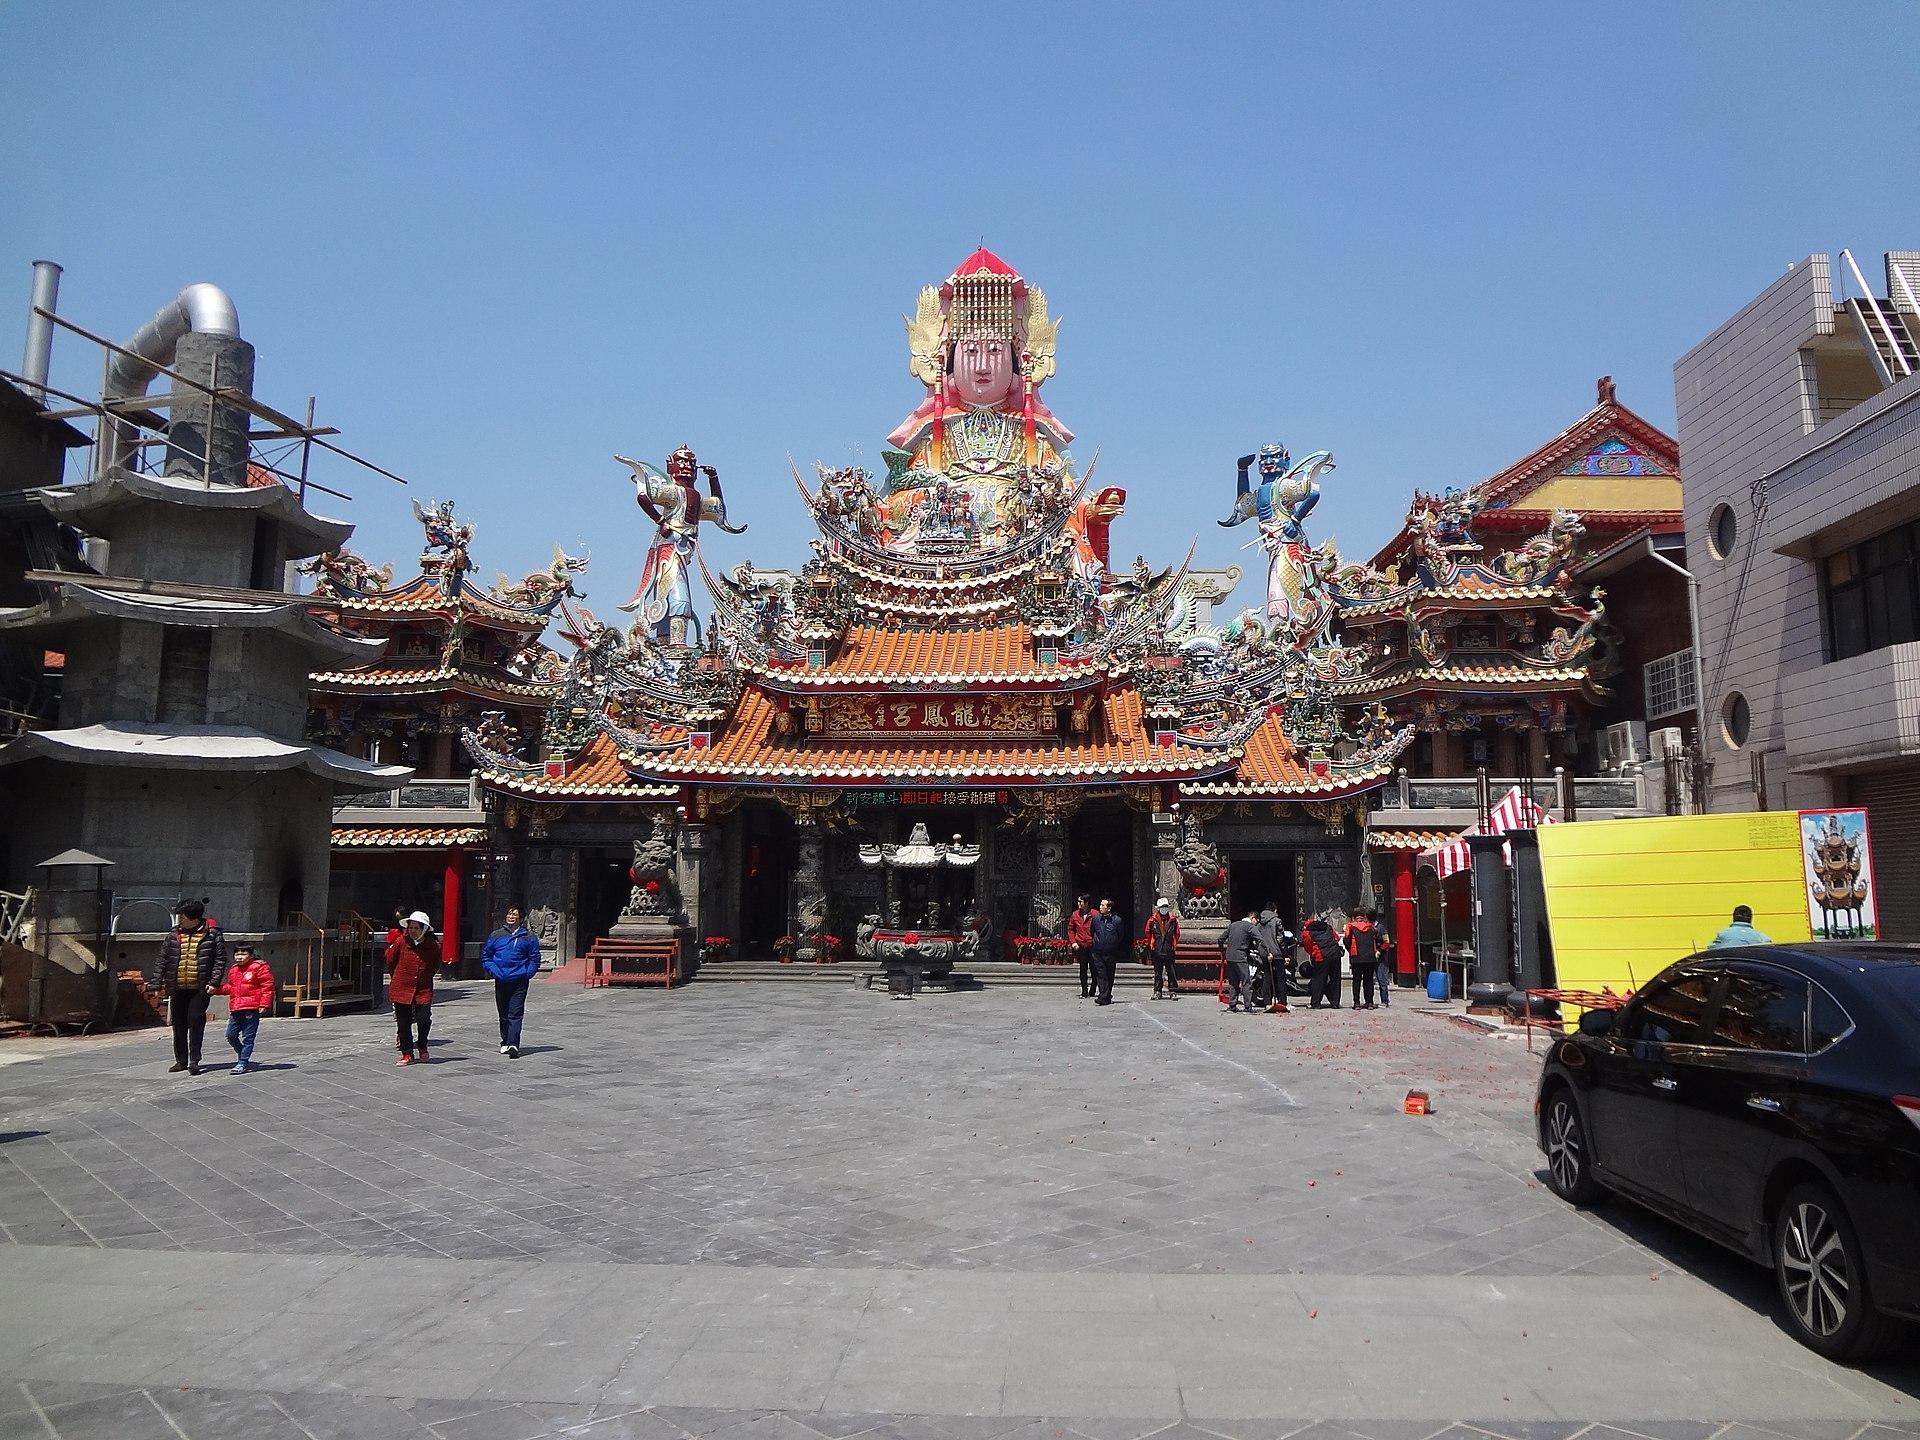 竹南鎮 - Wikipedia